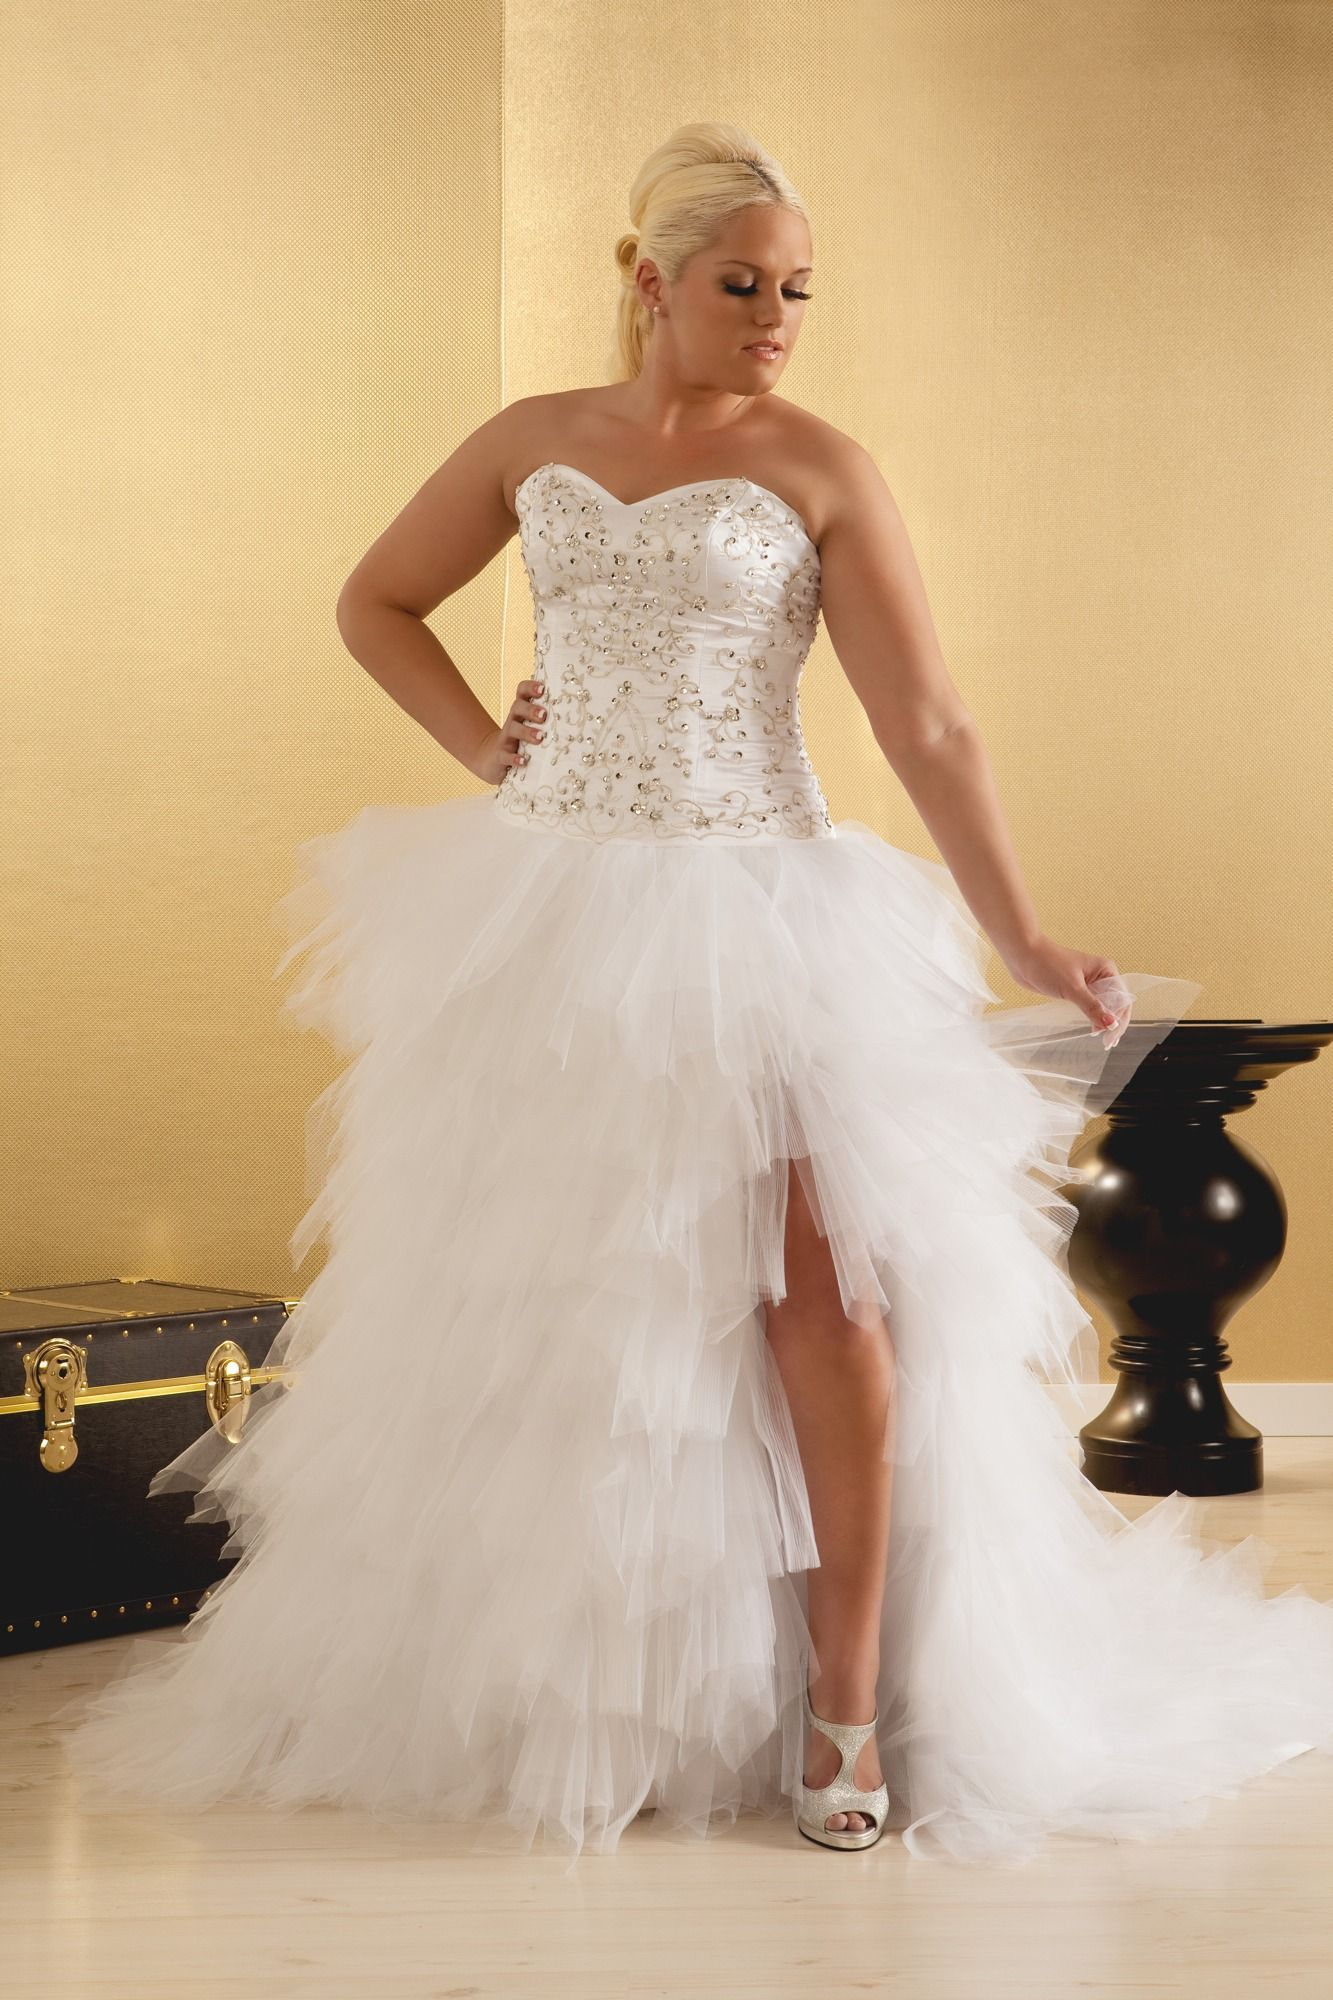 Wedding dresses for plus size brides  Kendall Plus Size Wedding Dress Plus Size Ball Gown  Real Size